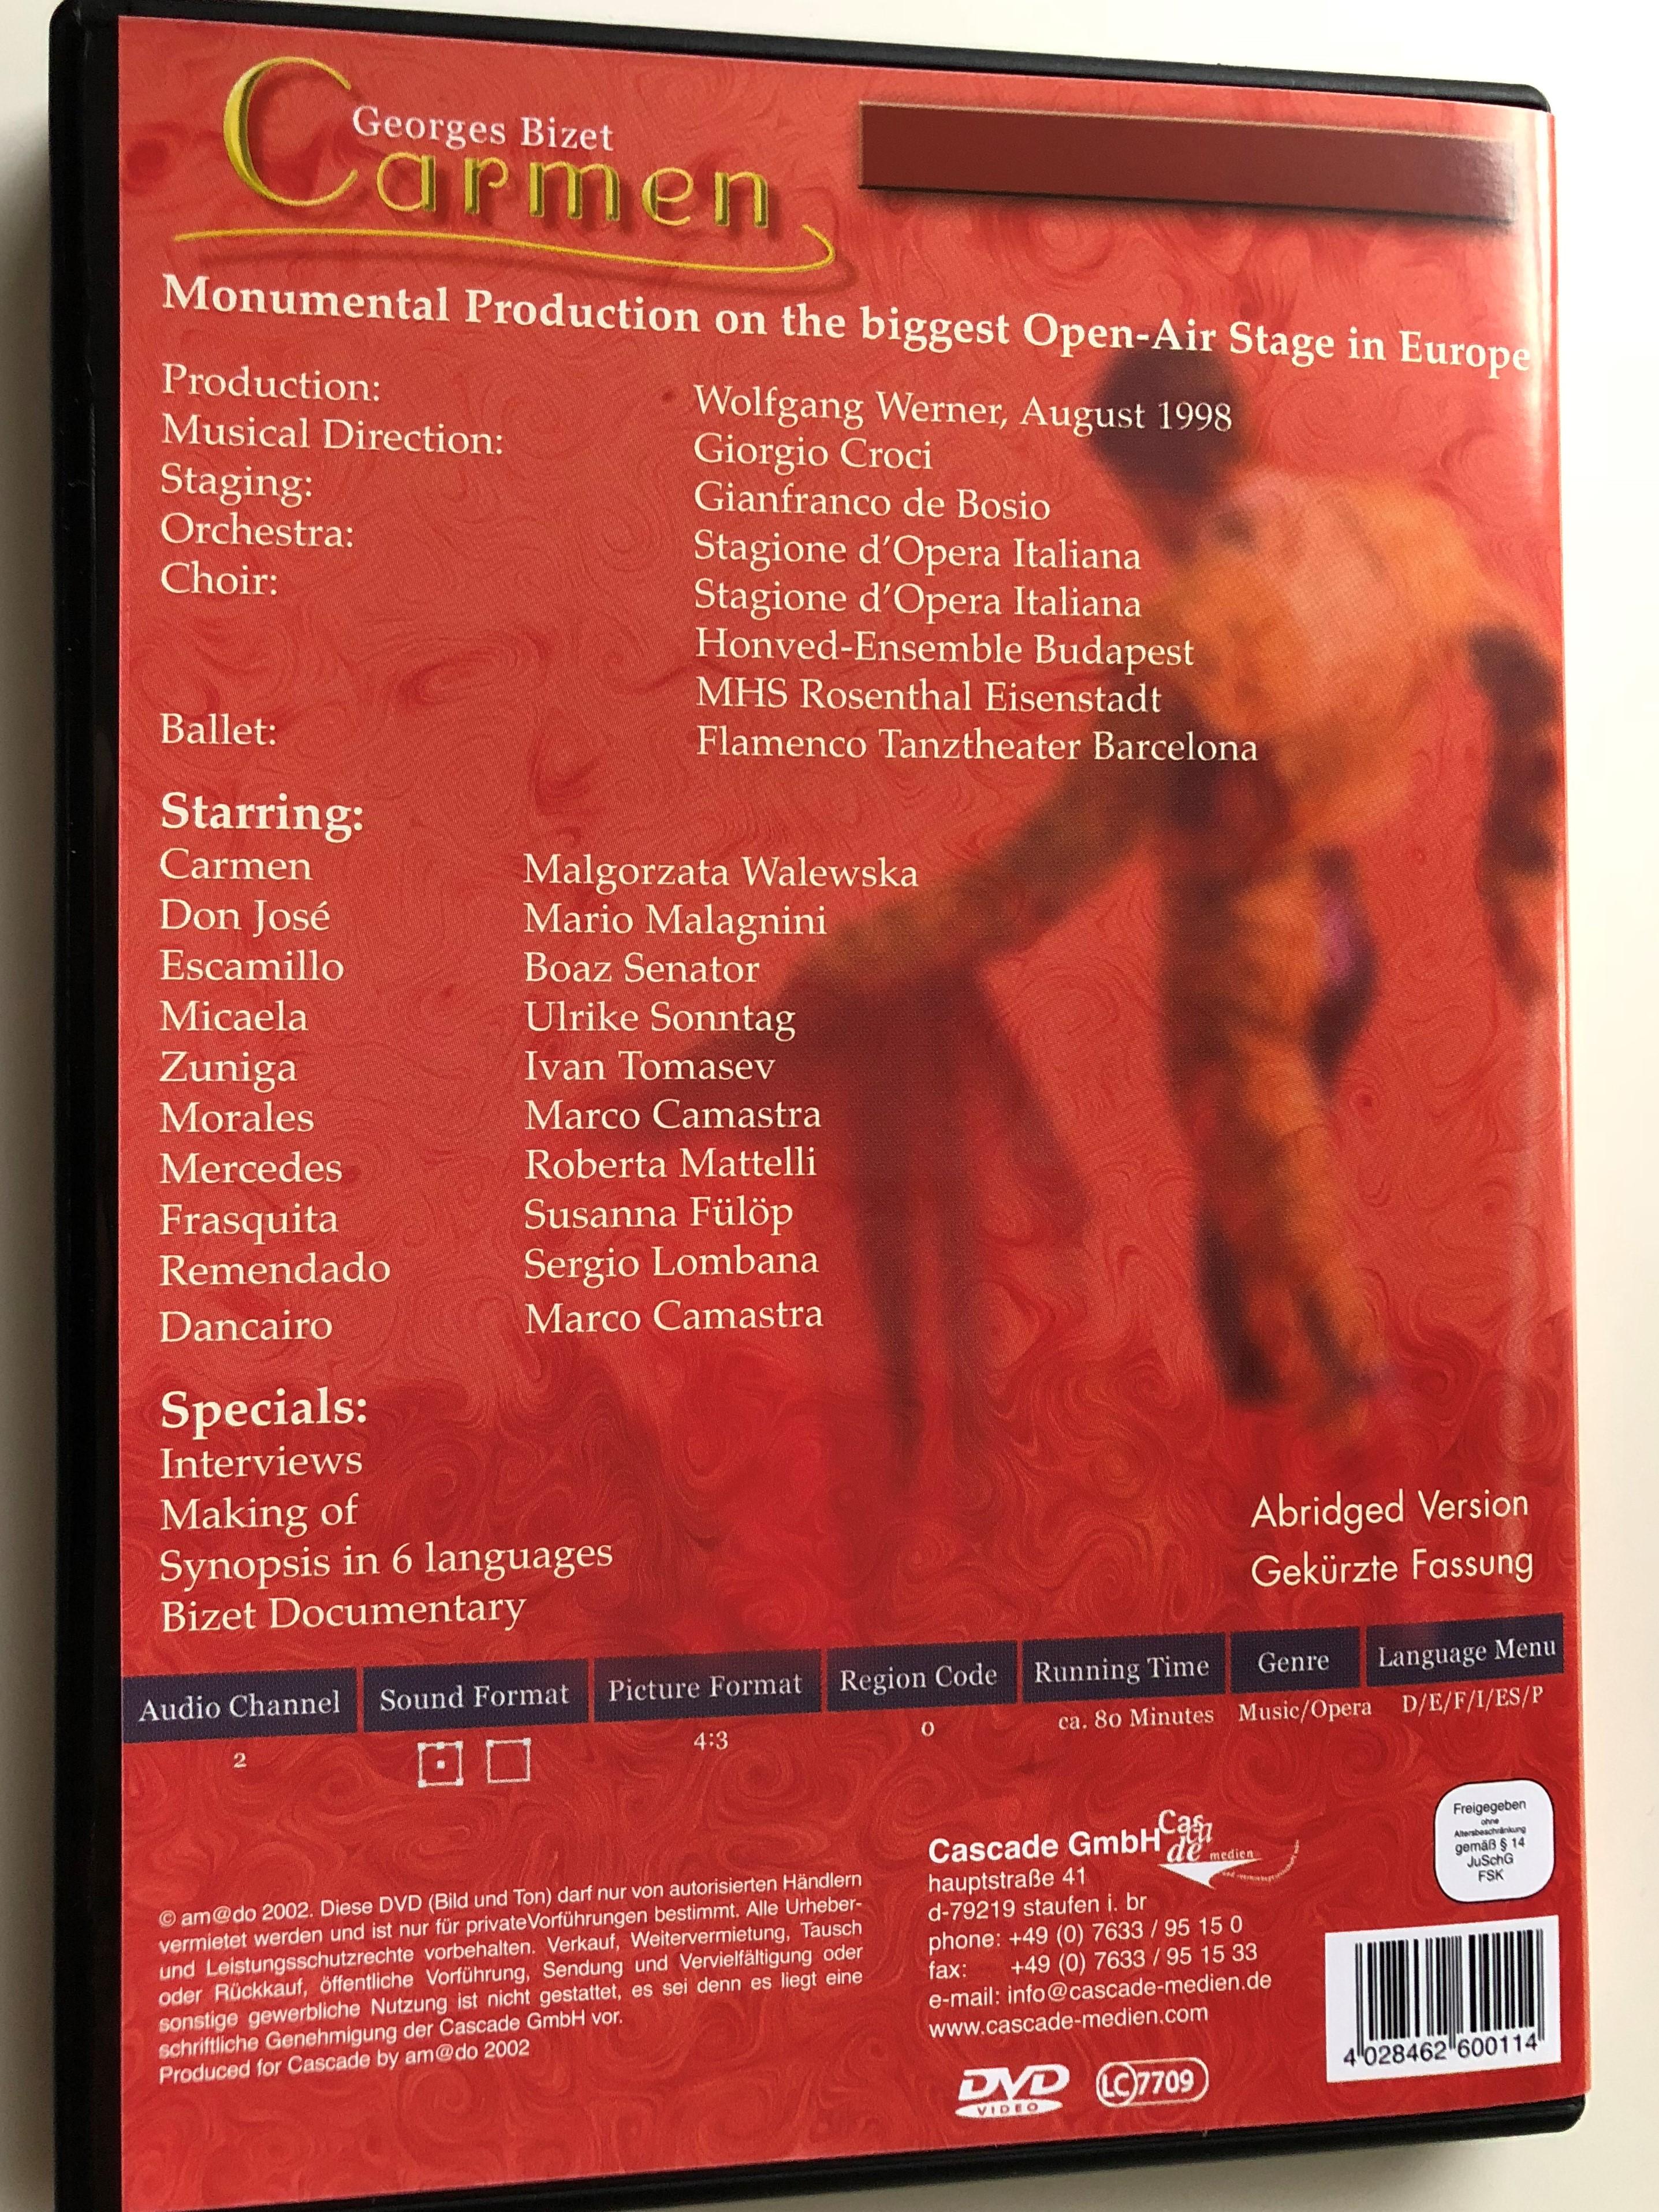 georges-bizet-carmen-dvd-2002-am-do-classics-malgorzata-walewska-mario-malagnini-boaz-senator-ulrike-sonntag-ivan-tomasev-stagione-d-opera-italiana-honv-d-ensemble-budapest-flamenco-tanztherater-barcelona-2-.jpg